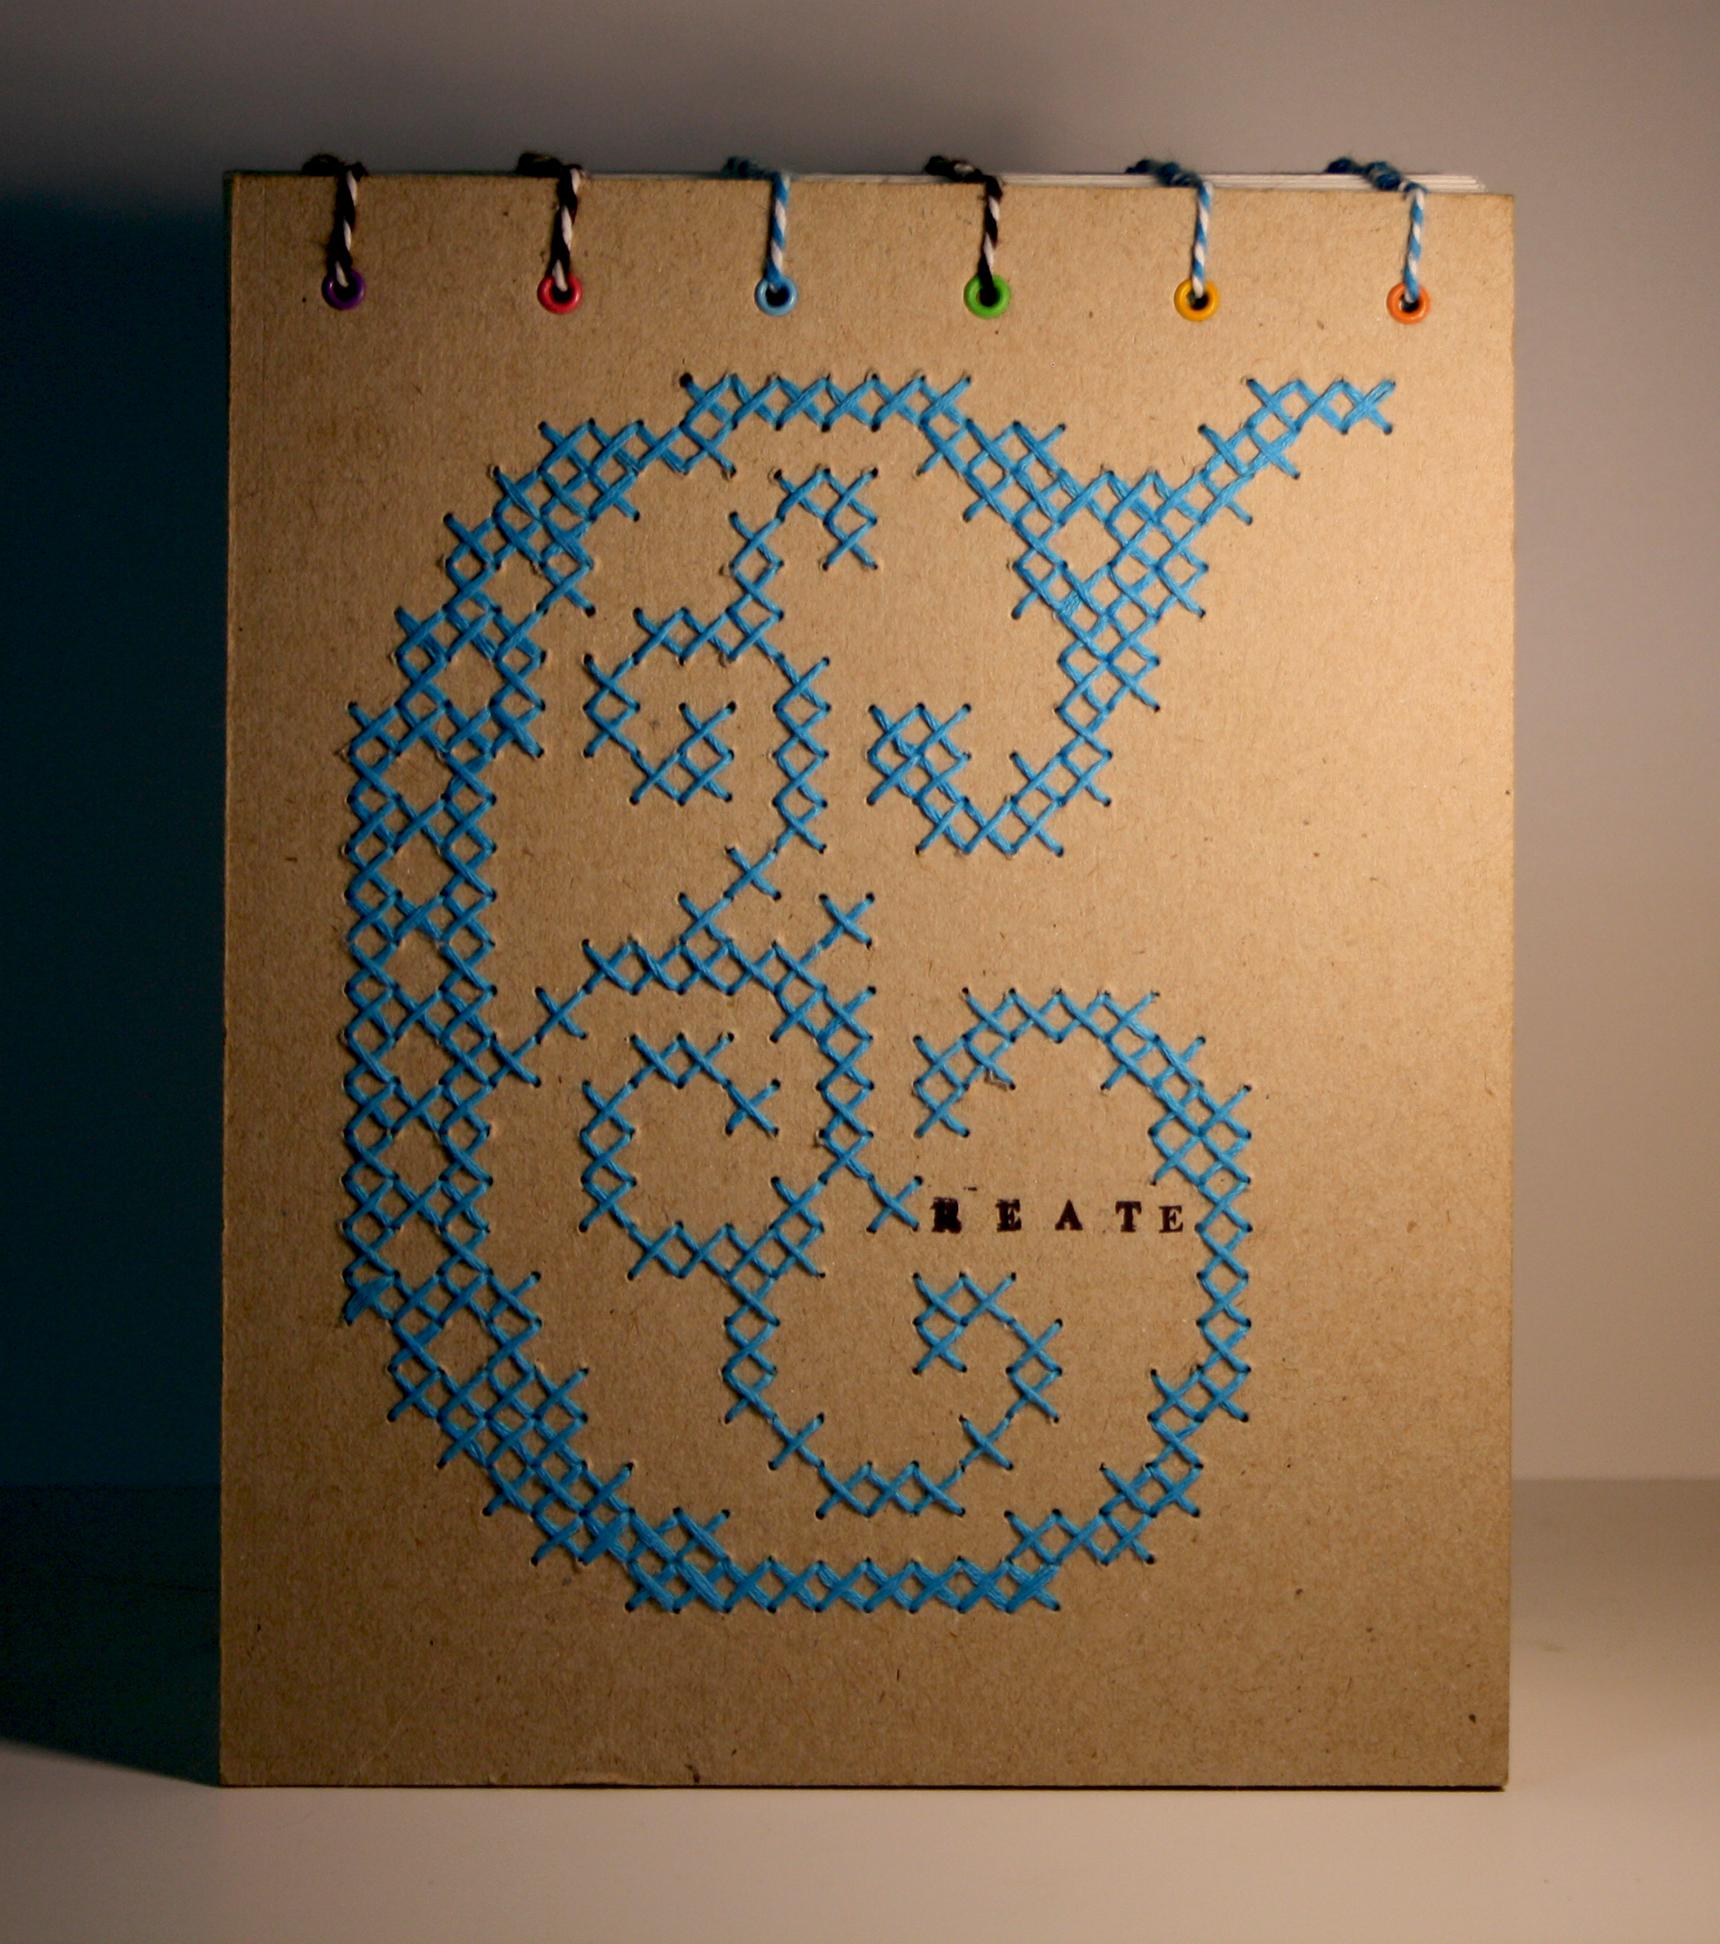 Bookbinding - Cross stitch - Create - Cover.jpg